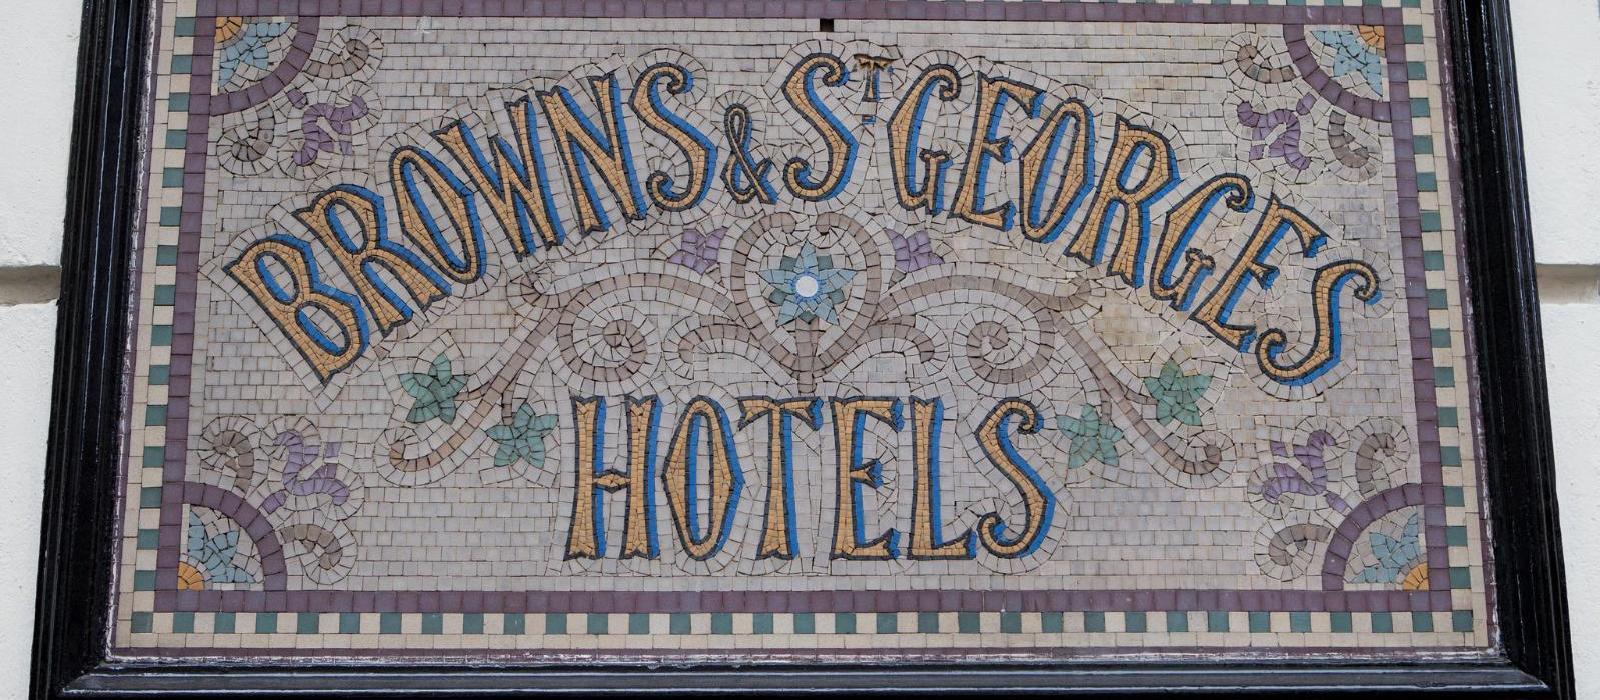 洛克福特布朗酒店(Rocco Forte Brown's Hotel) 图片  www.lhw.cn